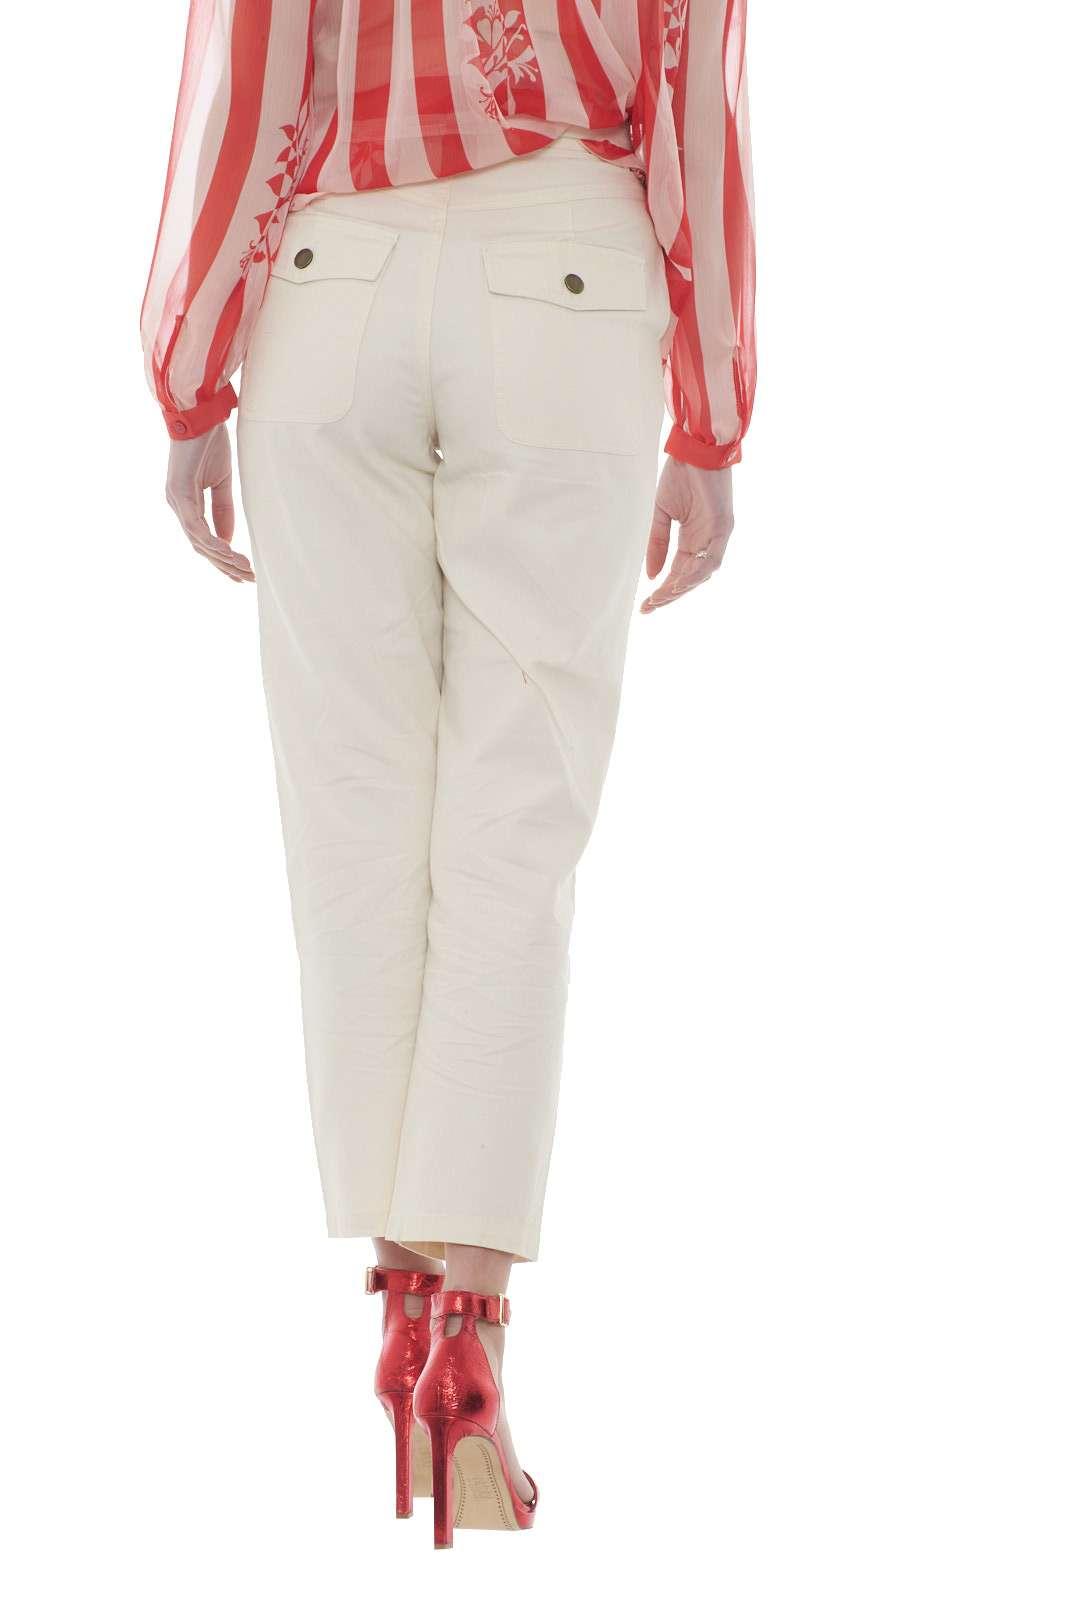 https://www.parmax.com/media/catalog/product/a/i/PE-outlet_parmax-pantaloni-donna-TwinSet-201TP2015-C.jpg